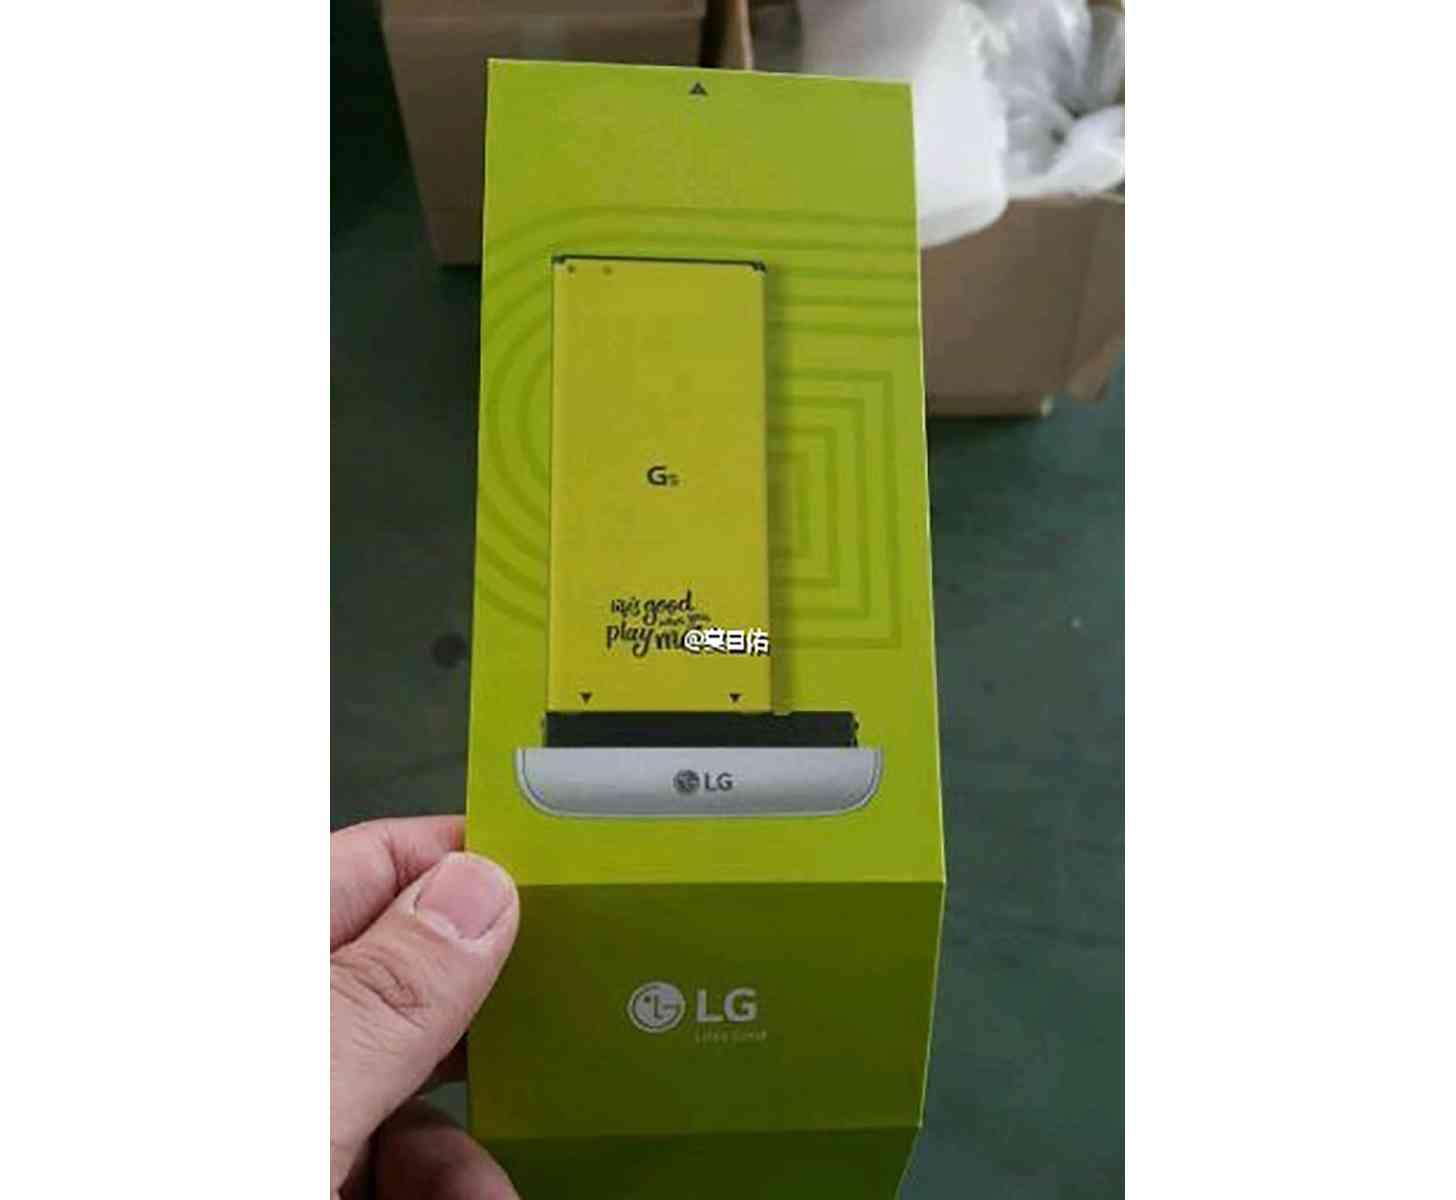 LG G5 Magic Slot removable battery leaked photo